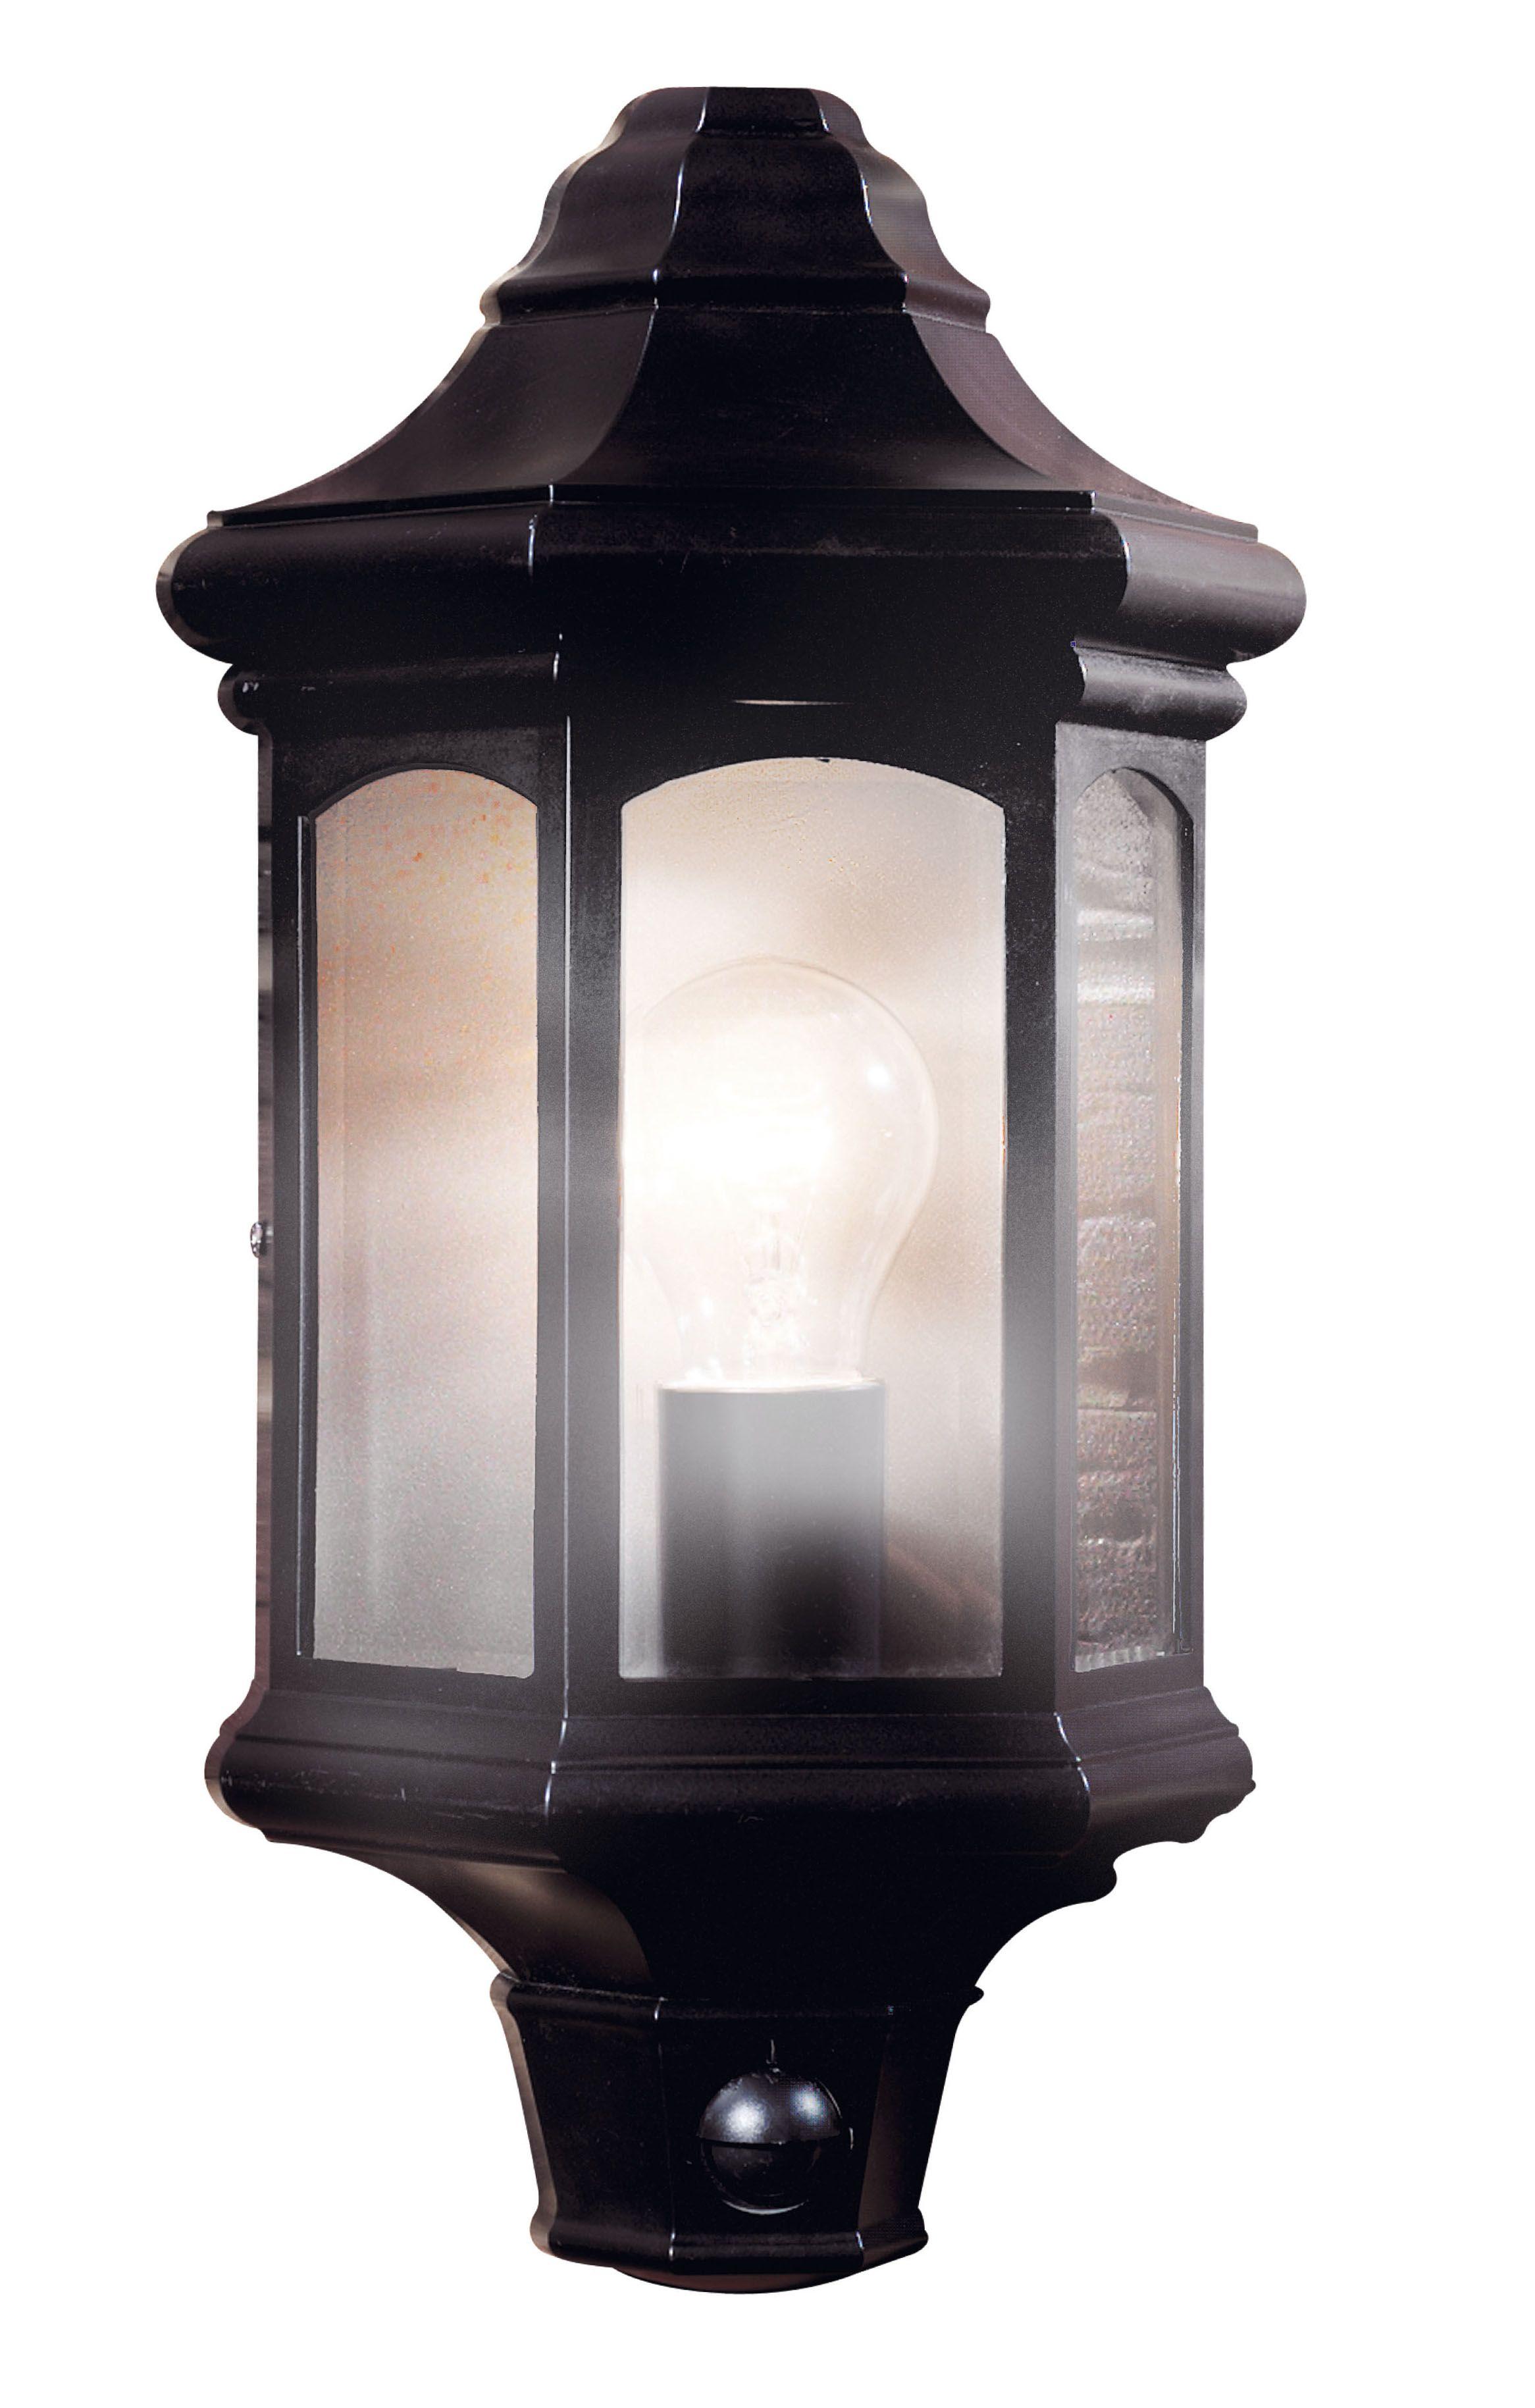 Pir Lights B Q Decoratingspecial Com